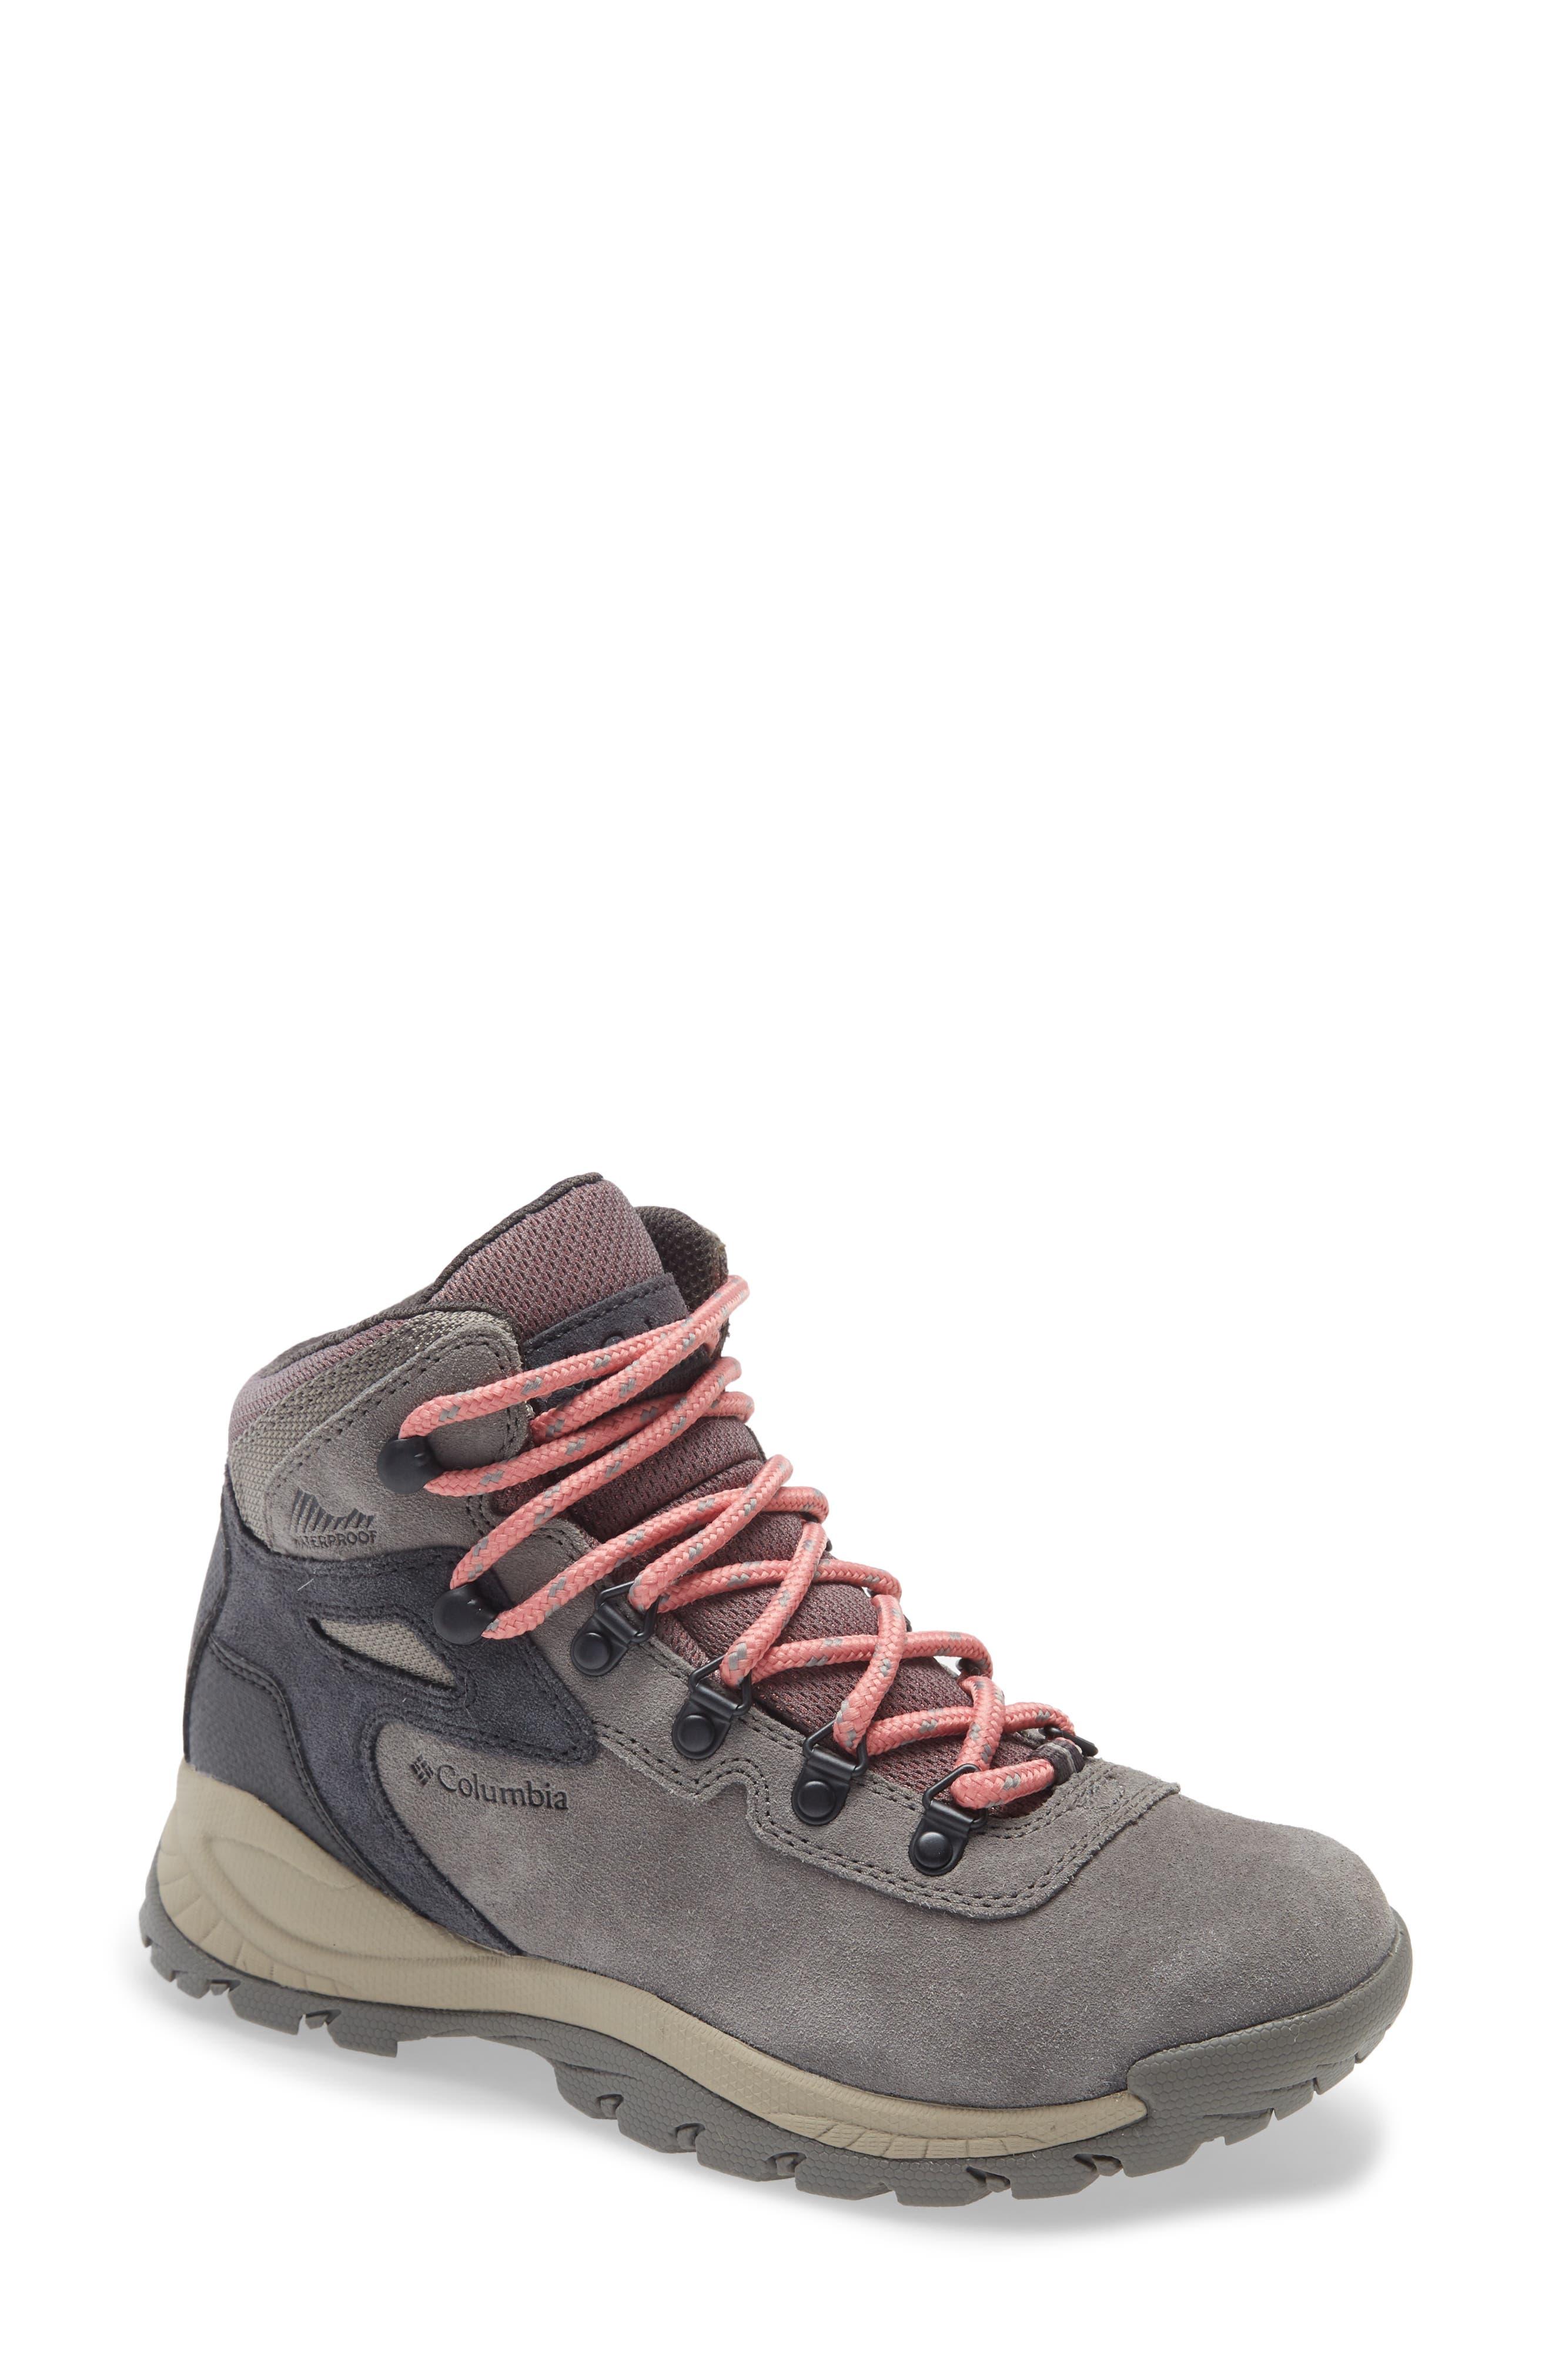 Newton Ridge(TM) Amped Waterproof Hiking Boot